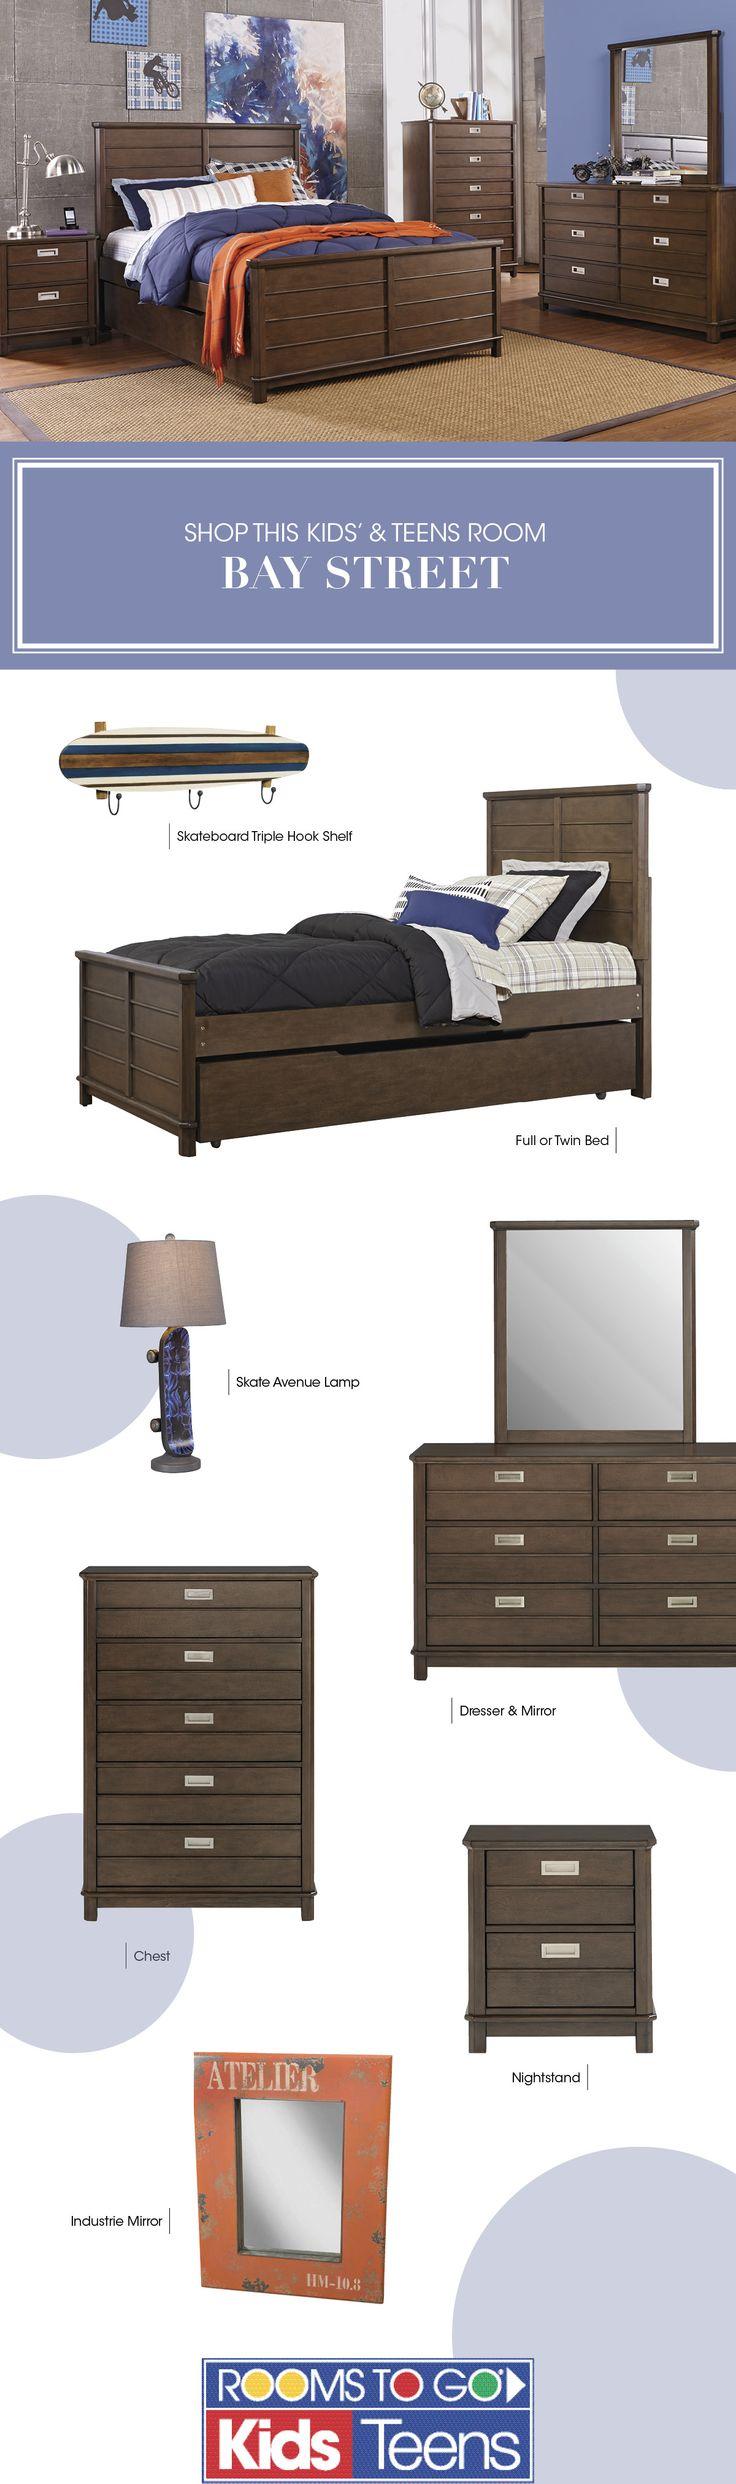 23 best boys room images on pinterest child room kid bedrooms